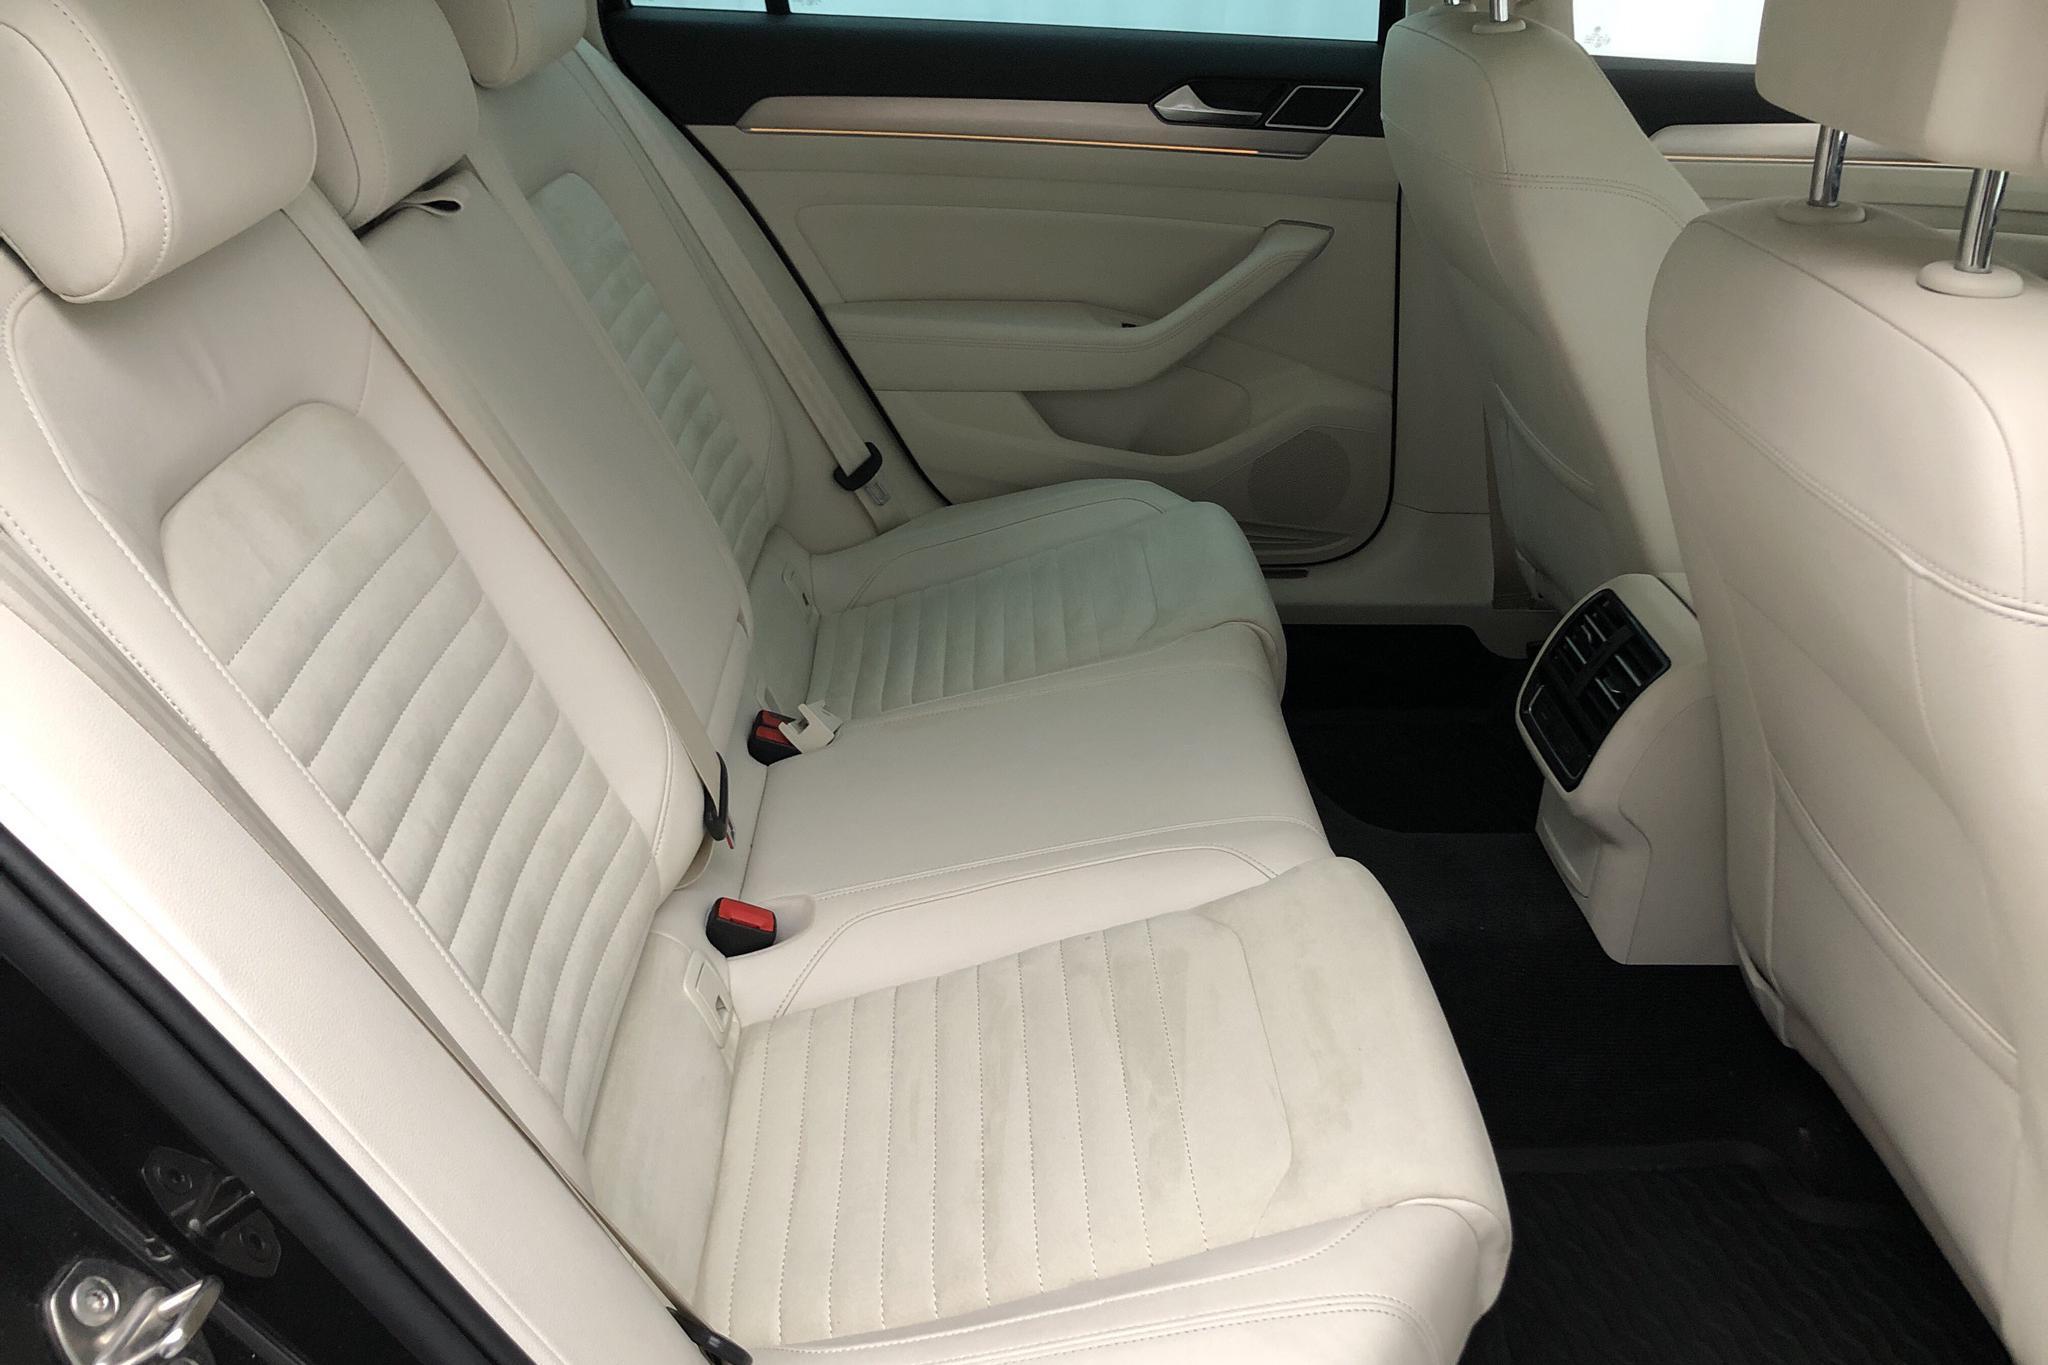 VW Passat 1.4 Plug-in-Hybrid Sportscombi (218hk) - 4 557 mil - Automat - Dark Grey - 2018